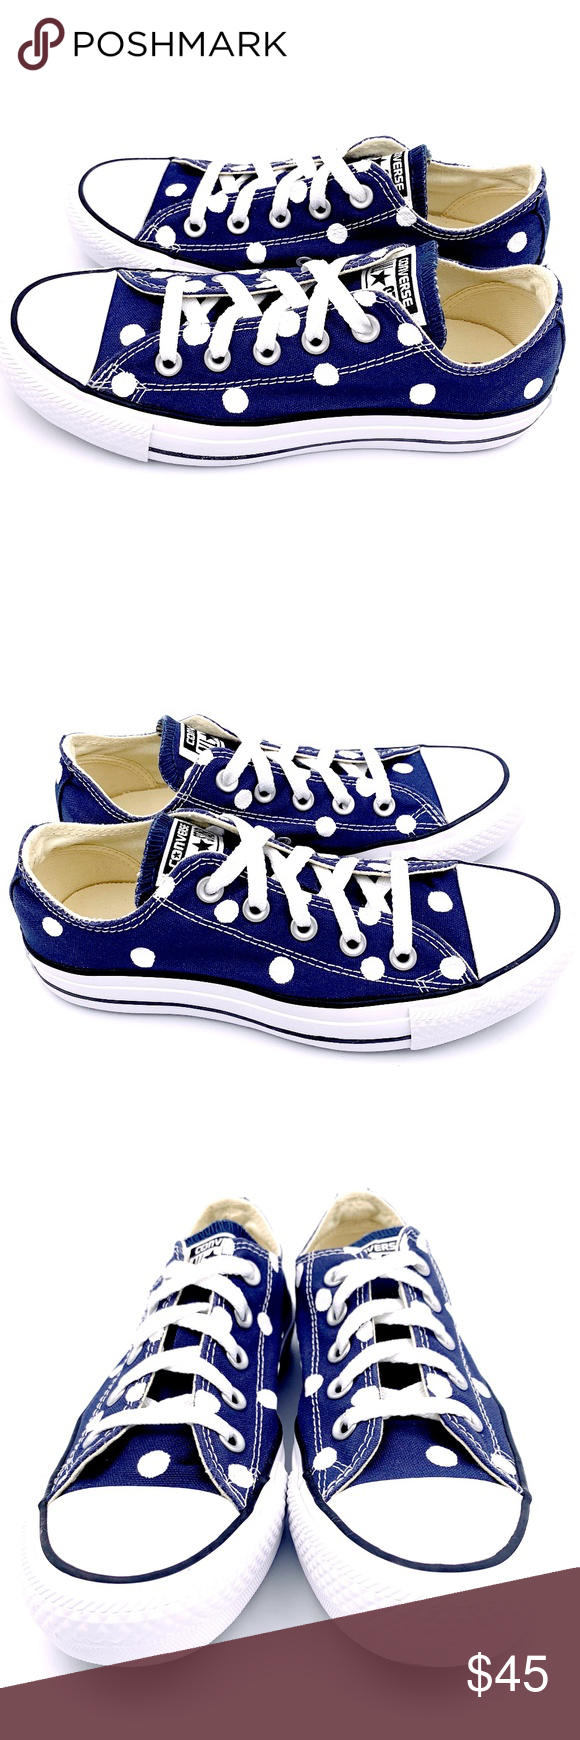 4d2ef8c94561 Converse 6 NAVY Blue Polka Dot Chuck Taylor AS Hand painted unisex Converse  Chuck Taylor All